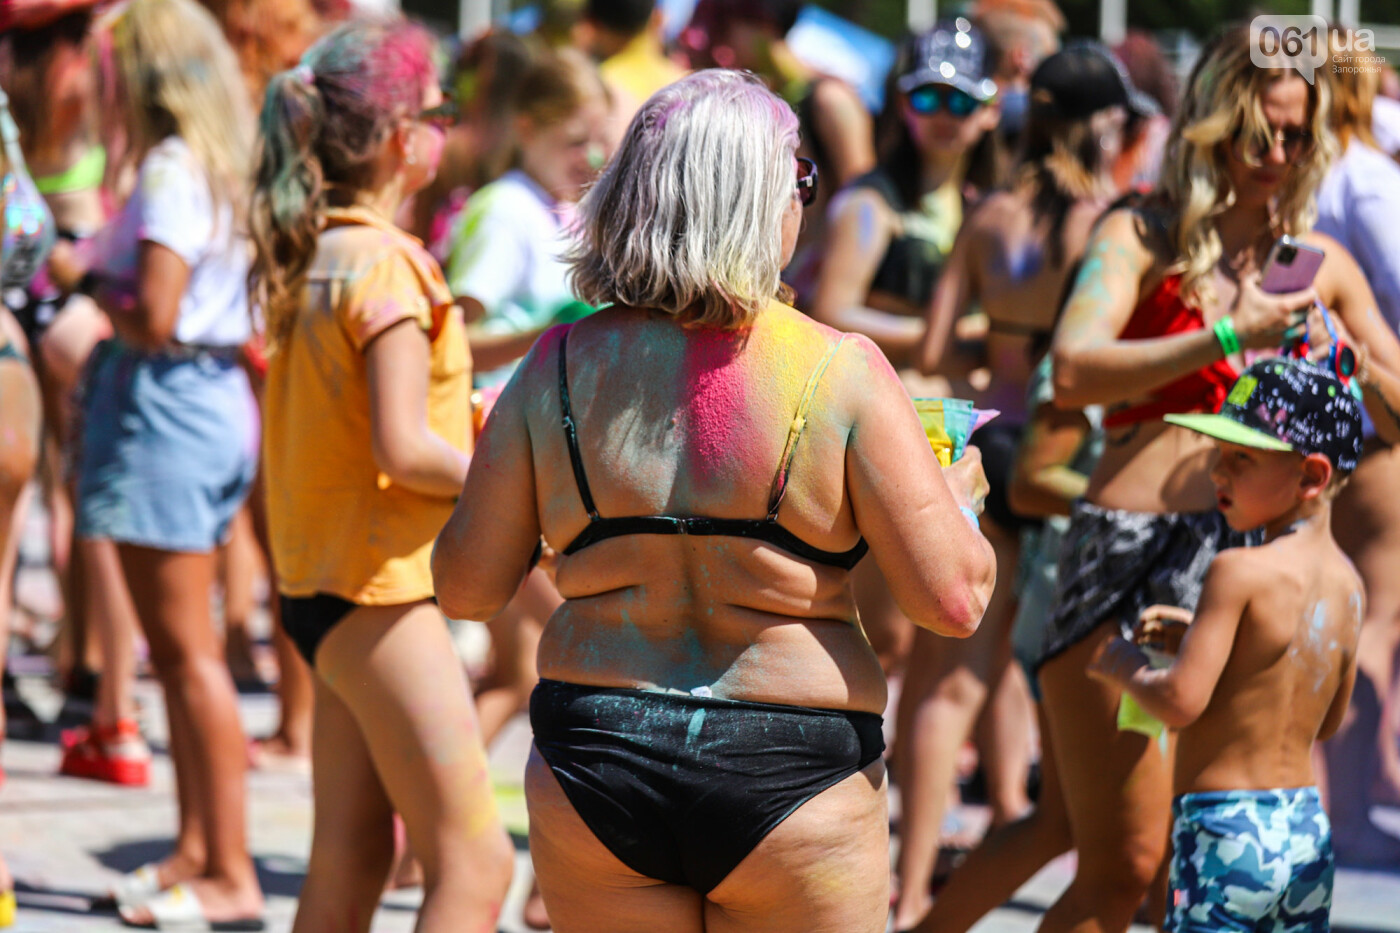 Сотни запорожцев приняли участие в фестивале красок Холи, - ФОТОРЕПОРТАЖ, фото-11